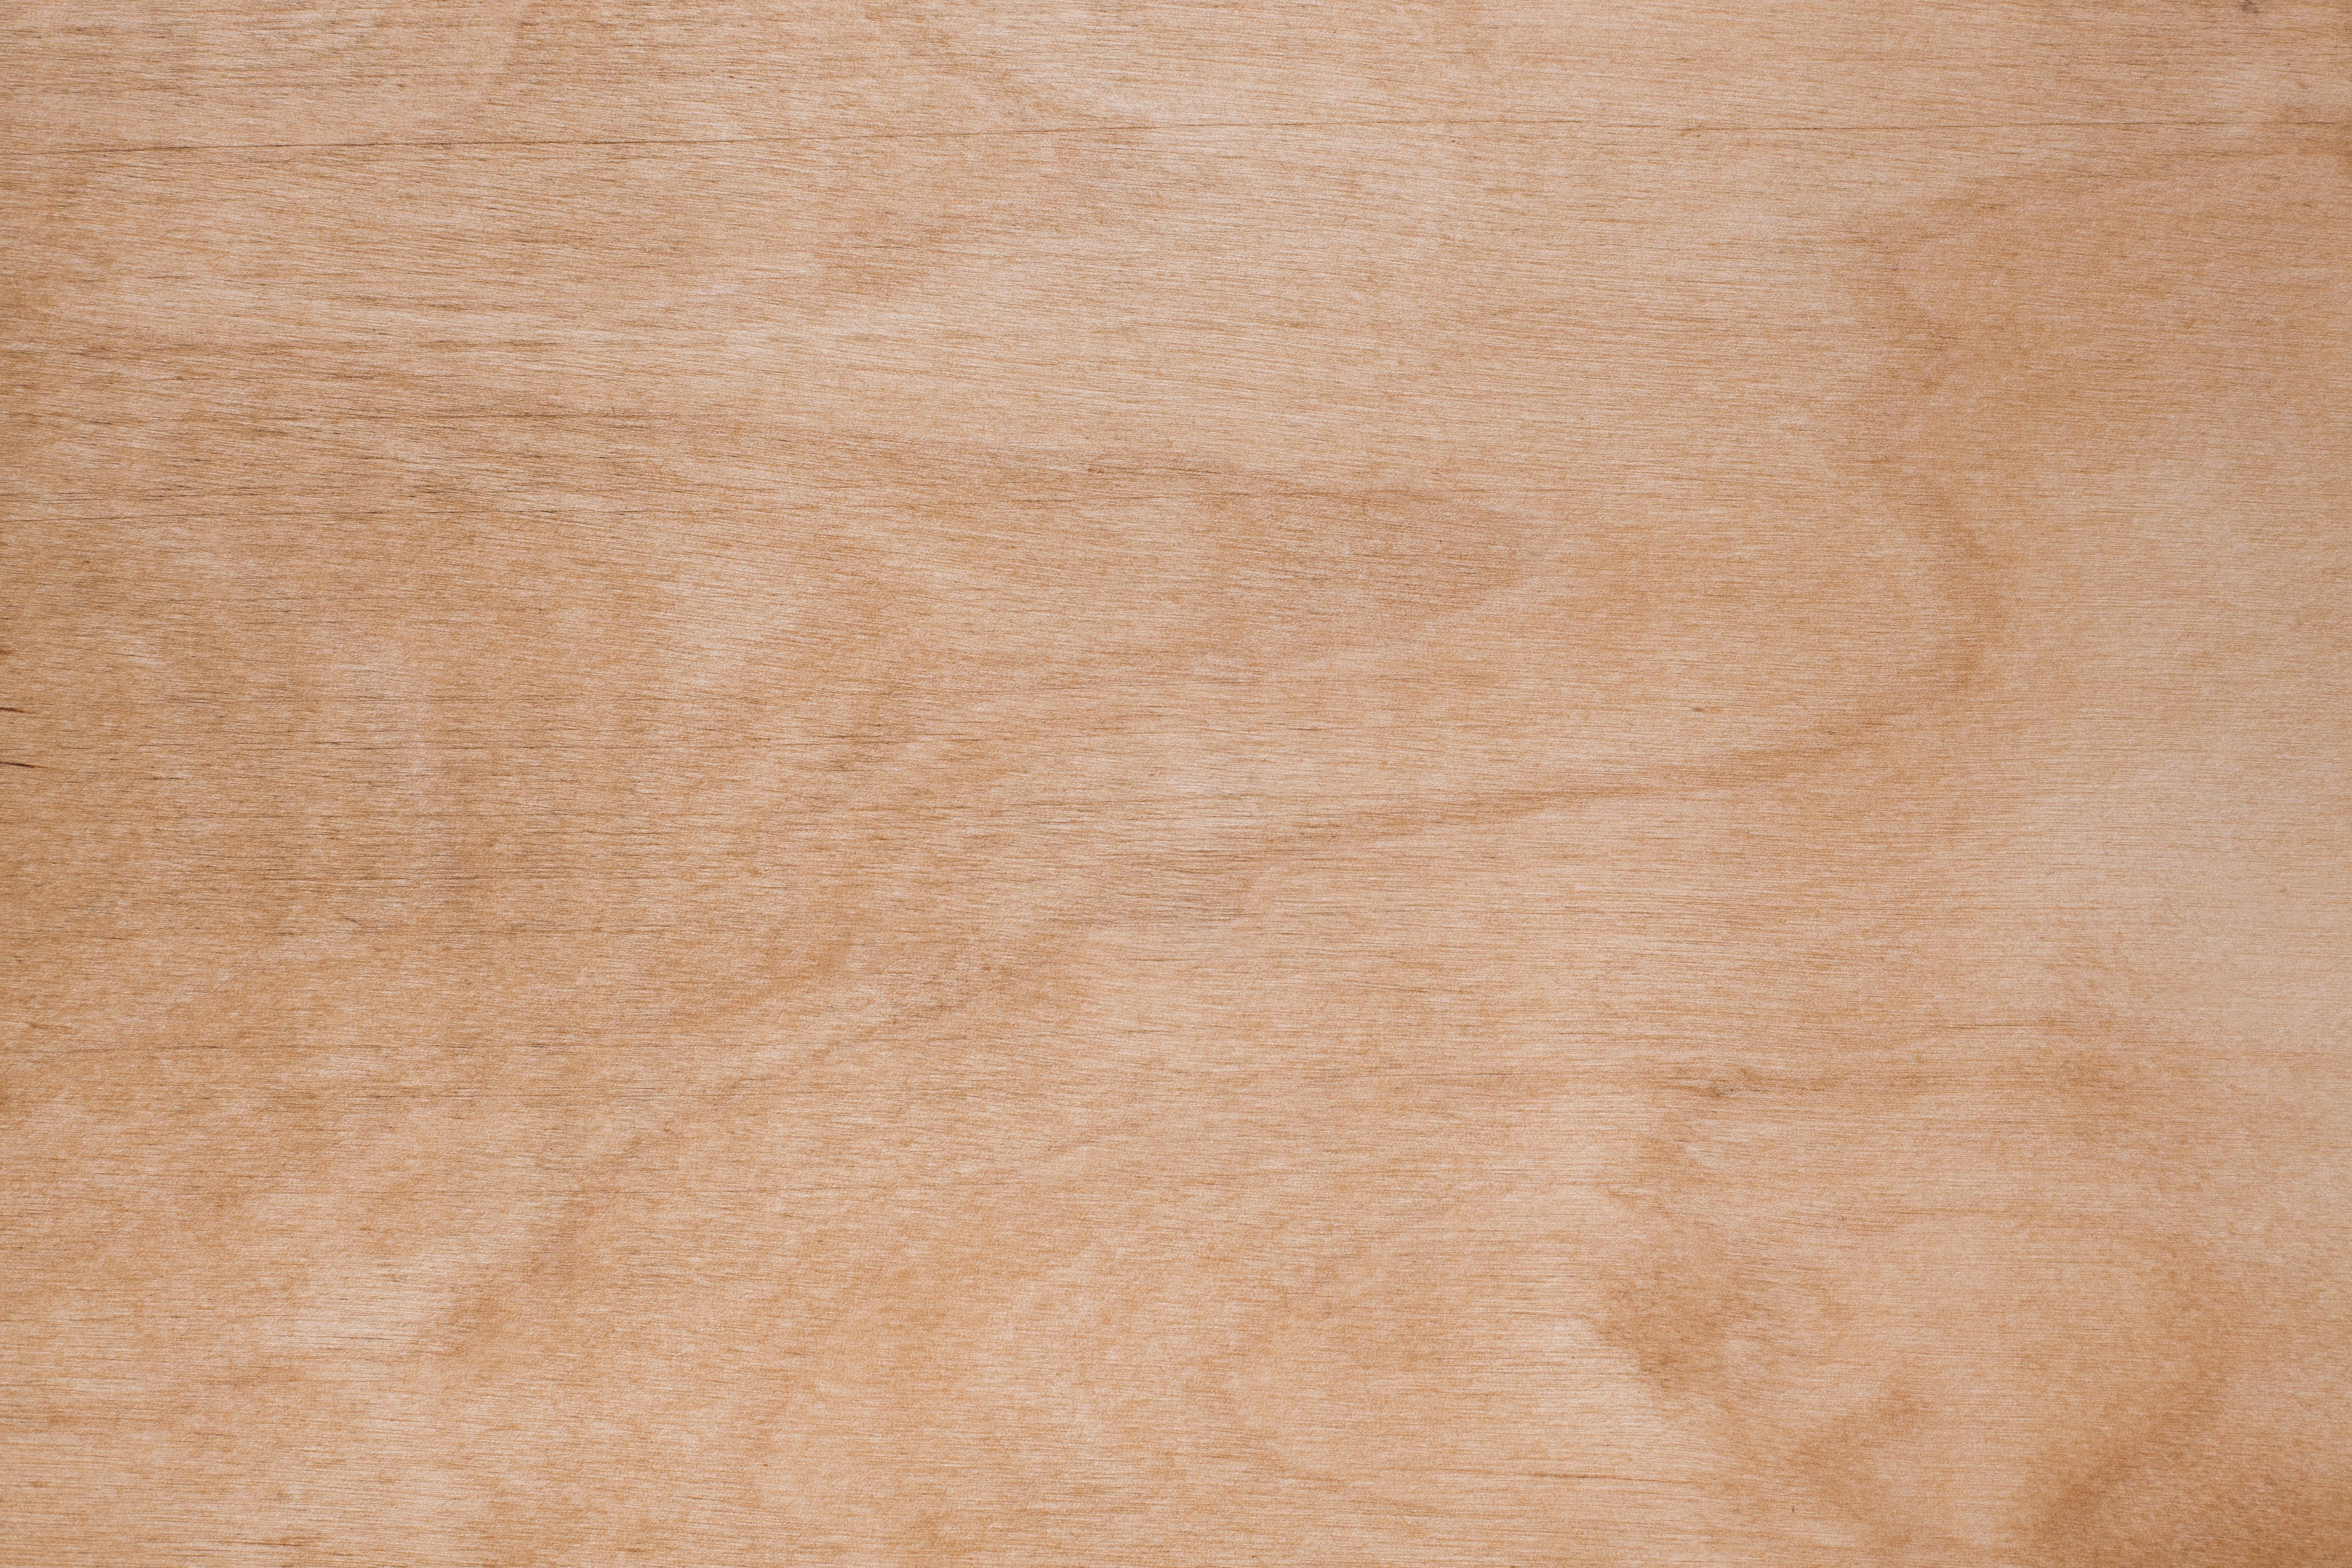 Clean Plywood Texture Wild Textures